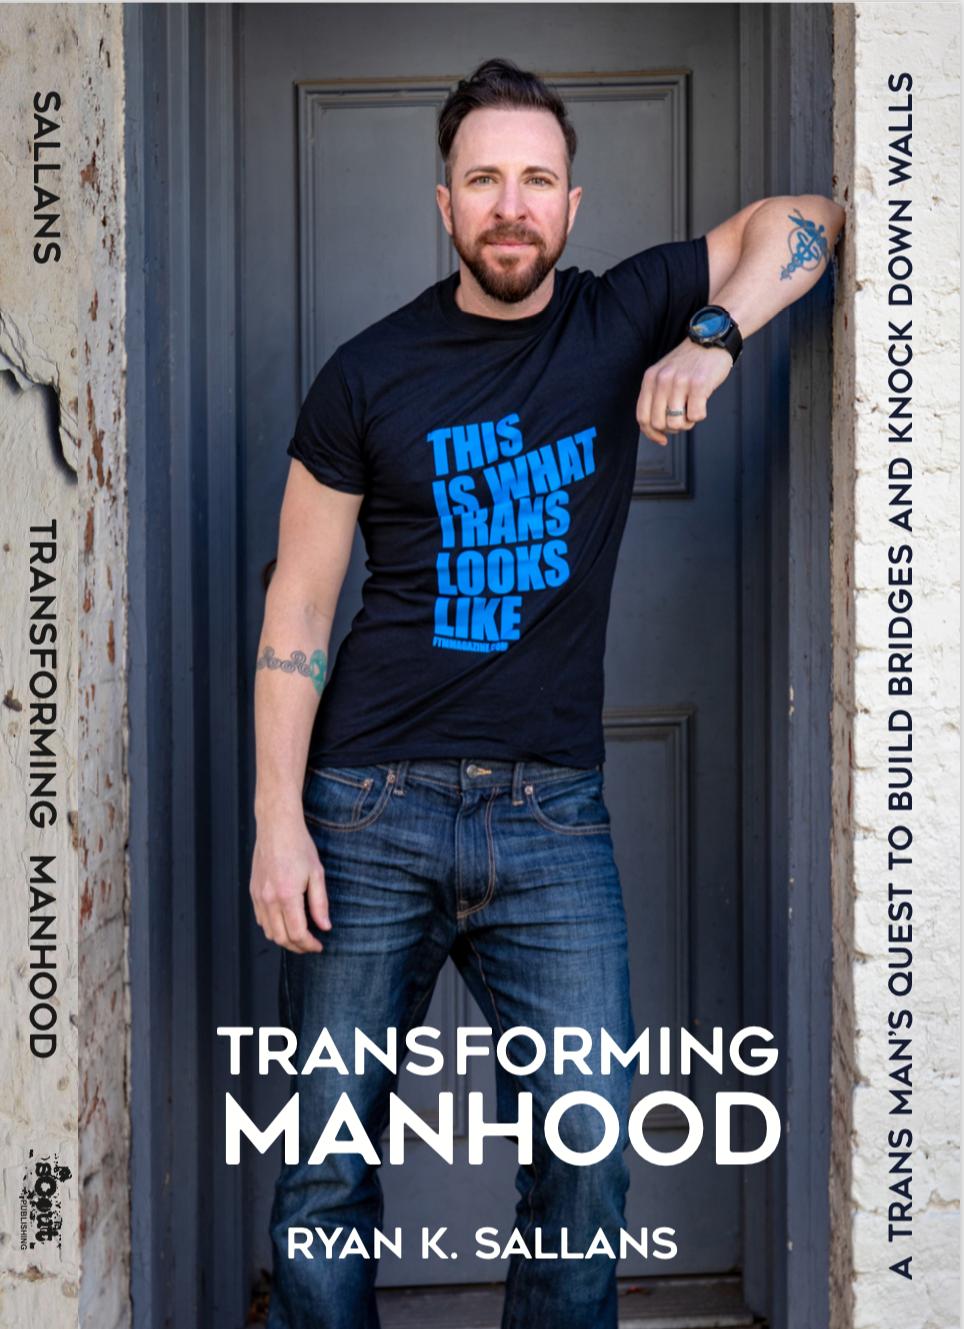 Transforming Manhood: A trans man's quest to build bridges and knock down walls